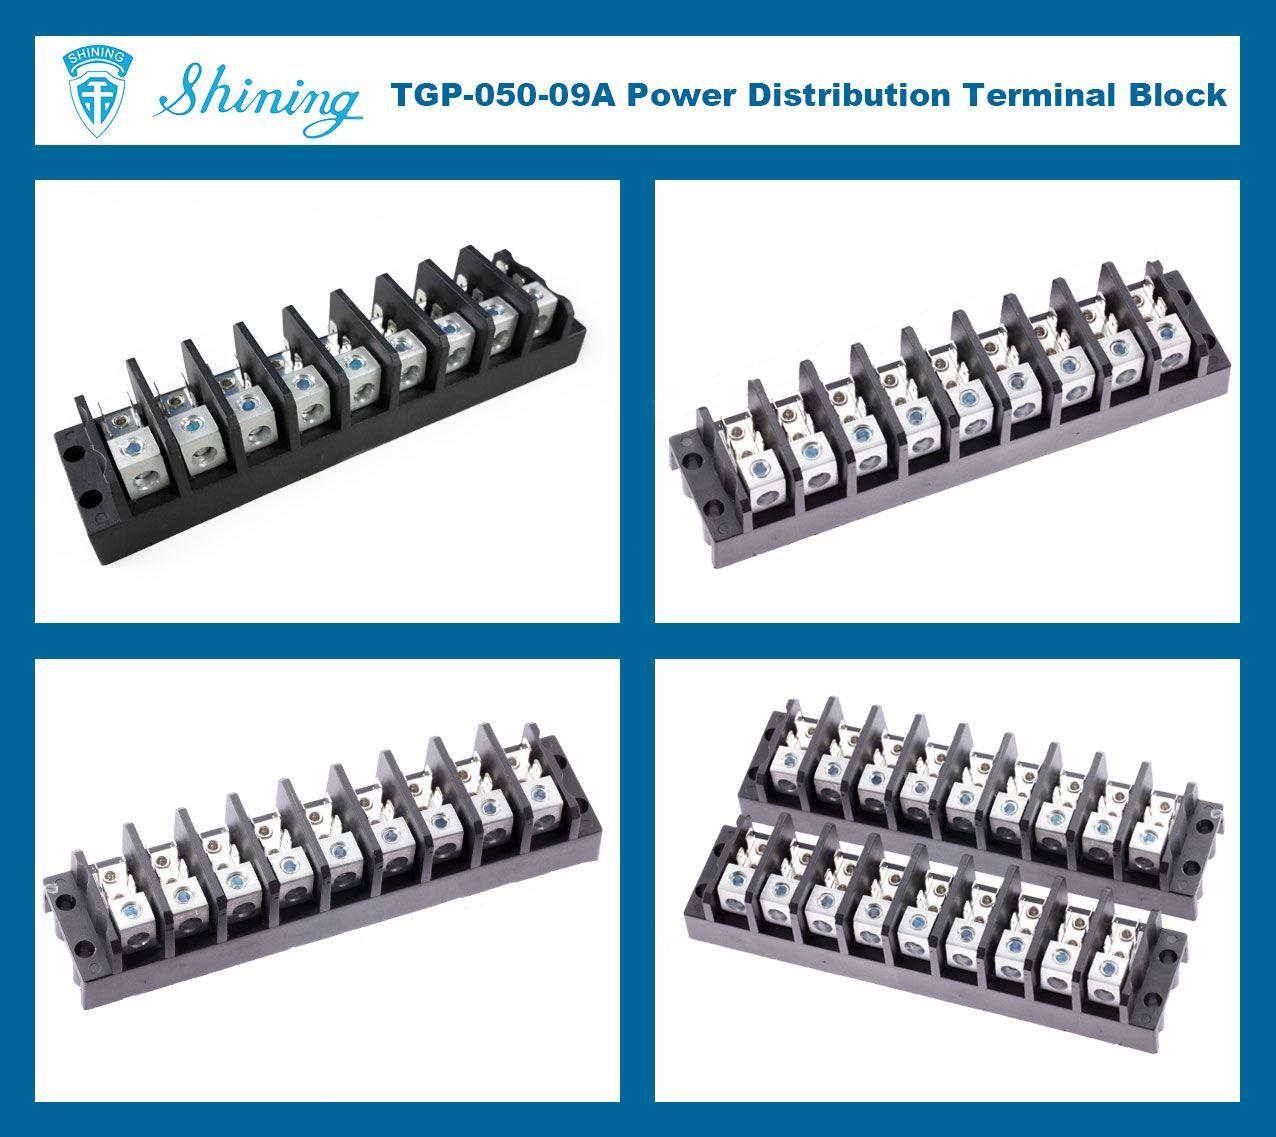 TGP-050-09A 600V 50A 9 Pole Electrical Power Terminal Block